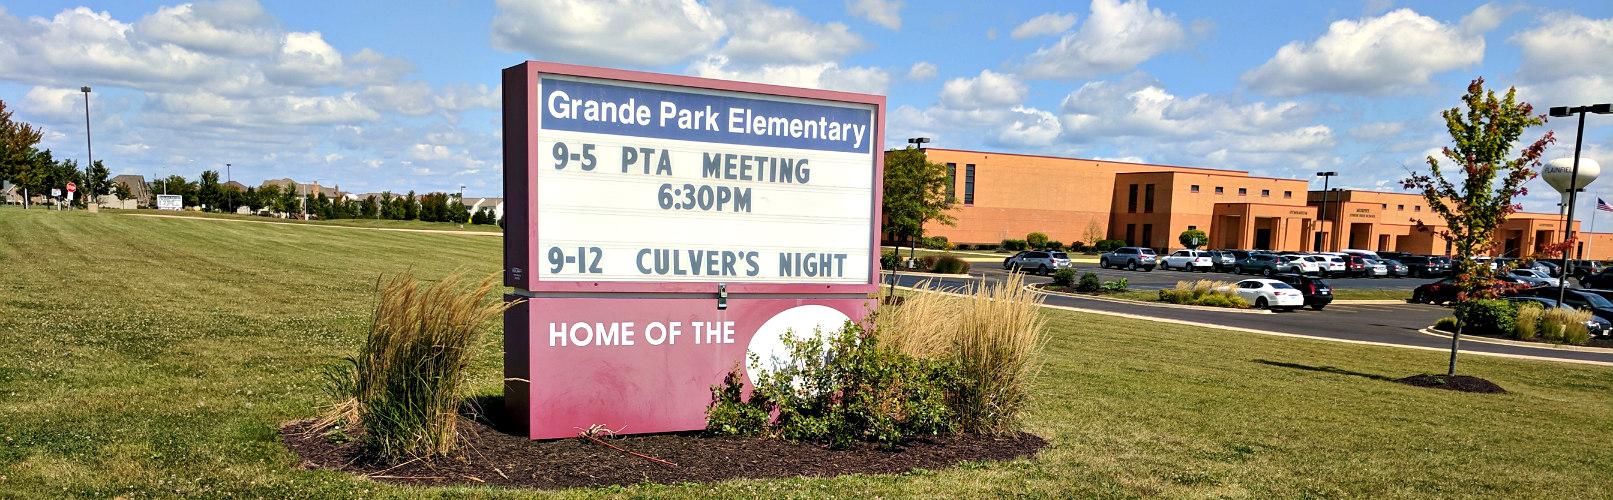 Grande Park Elementary School